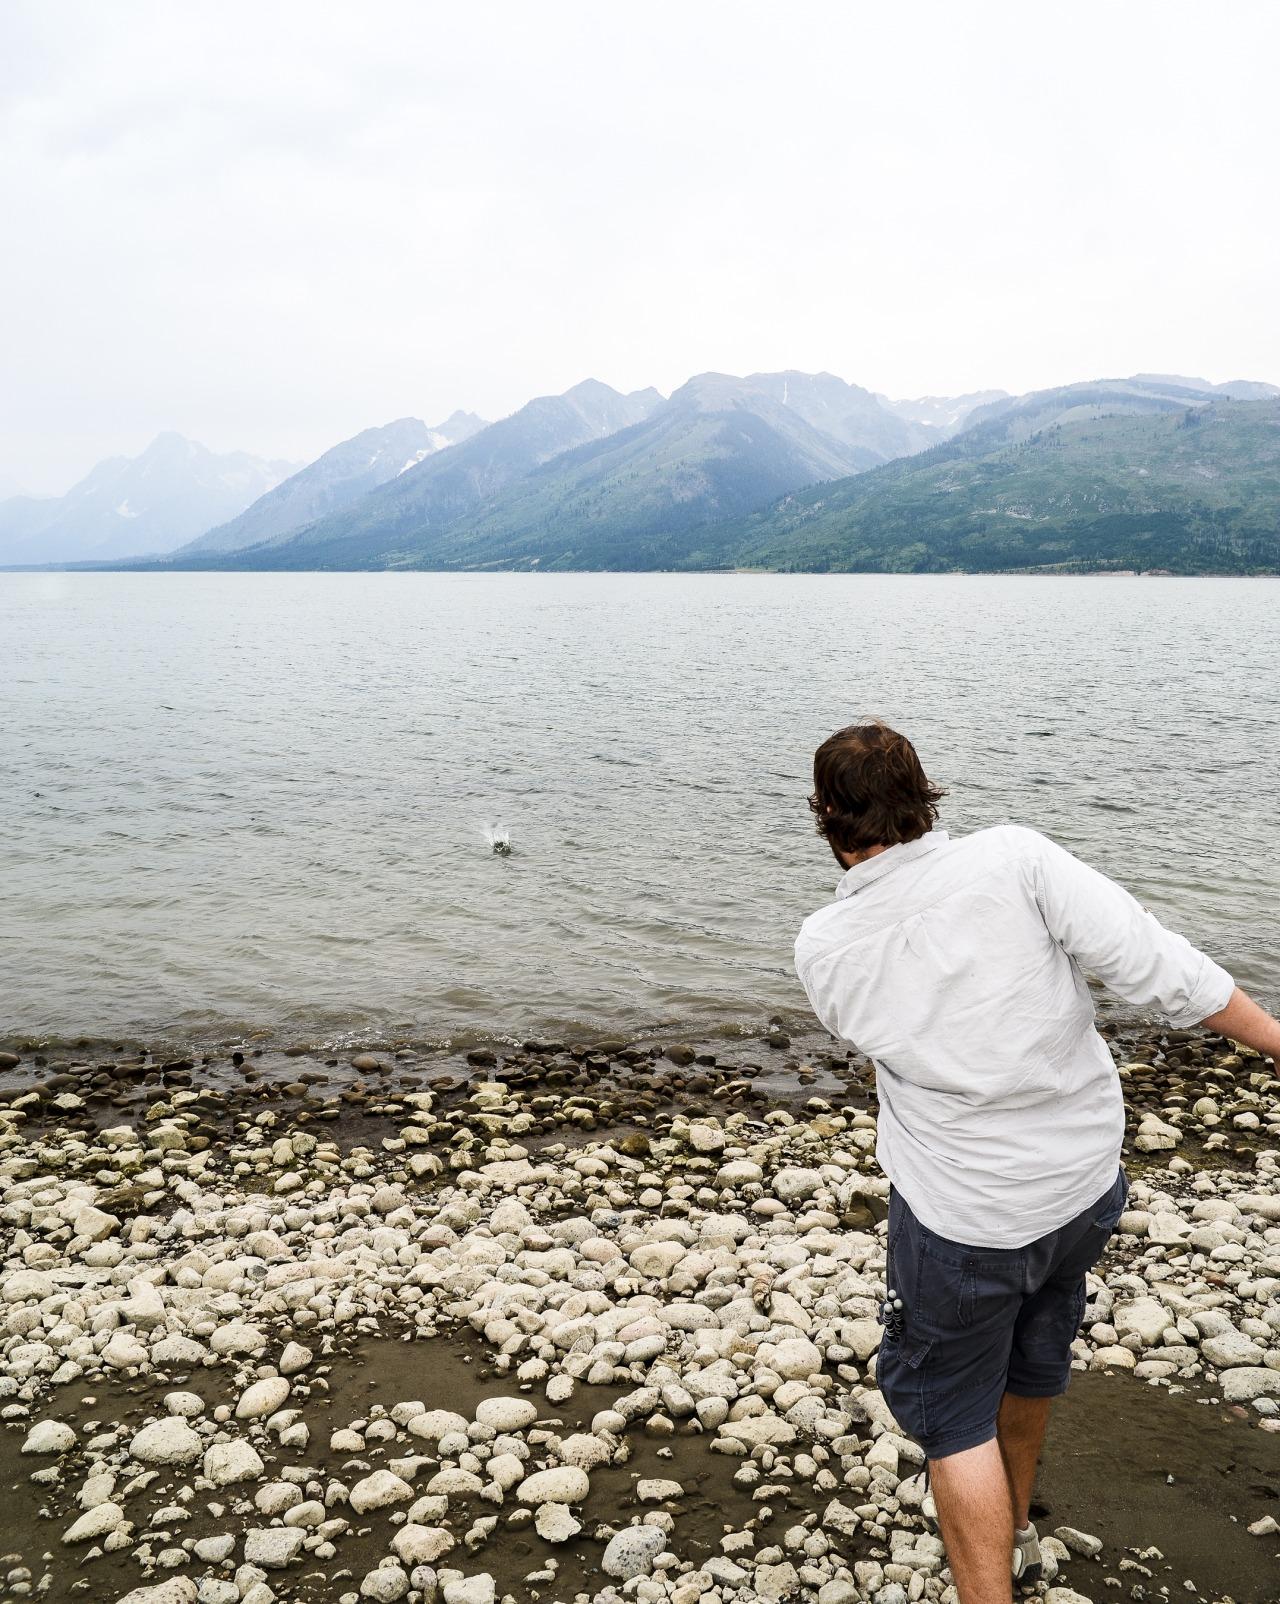 Roger skipping stones